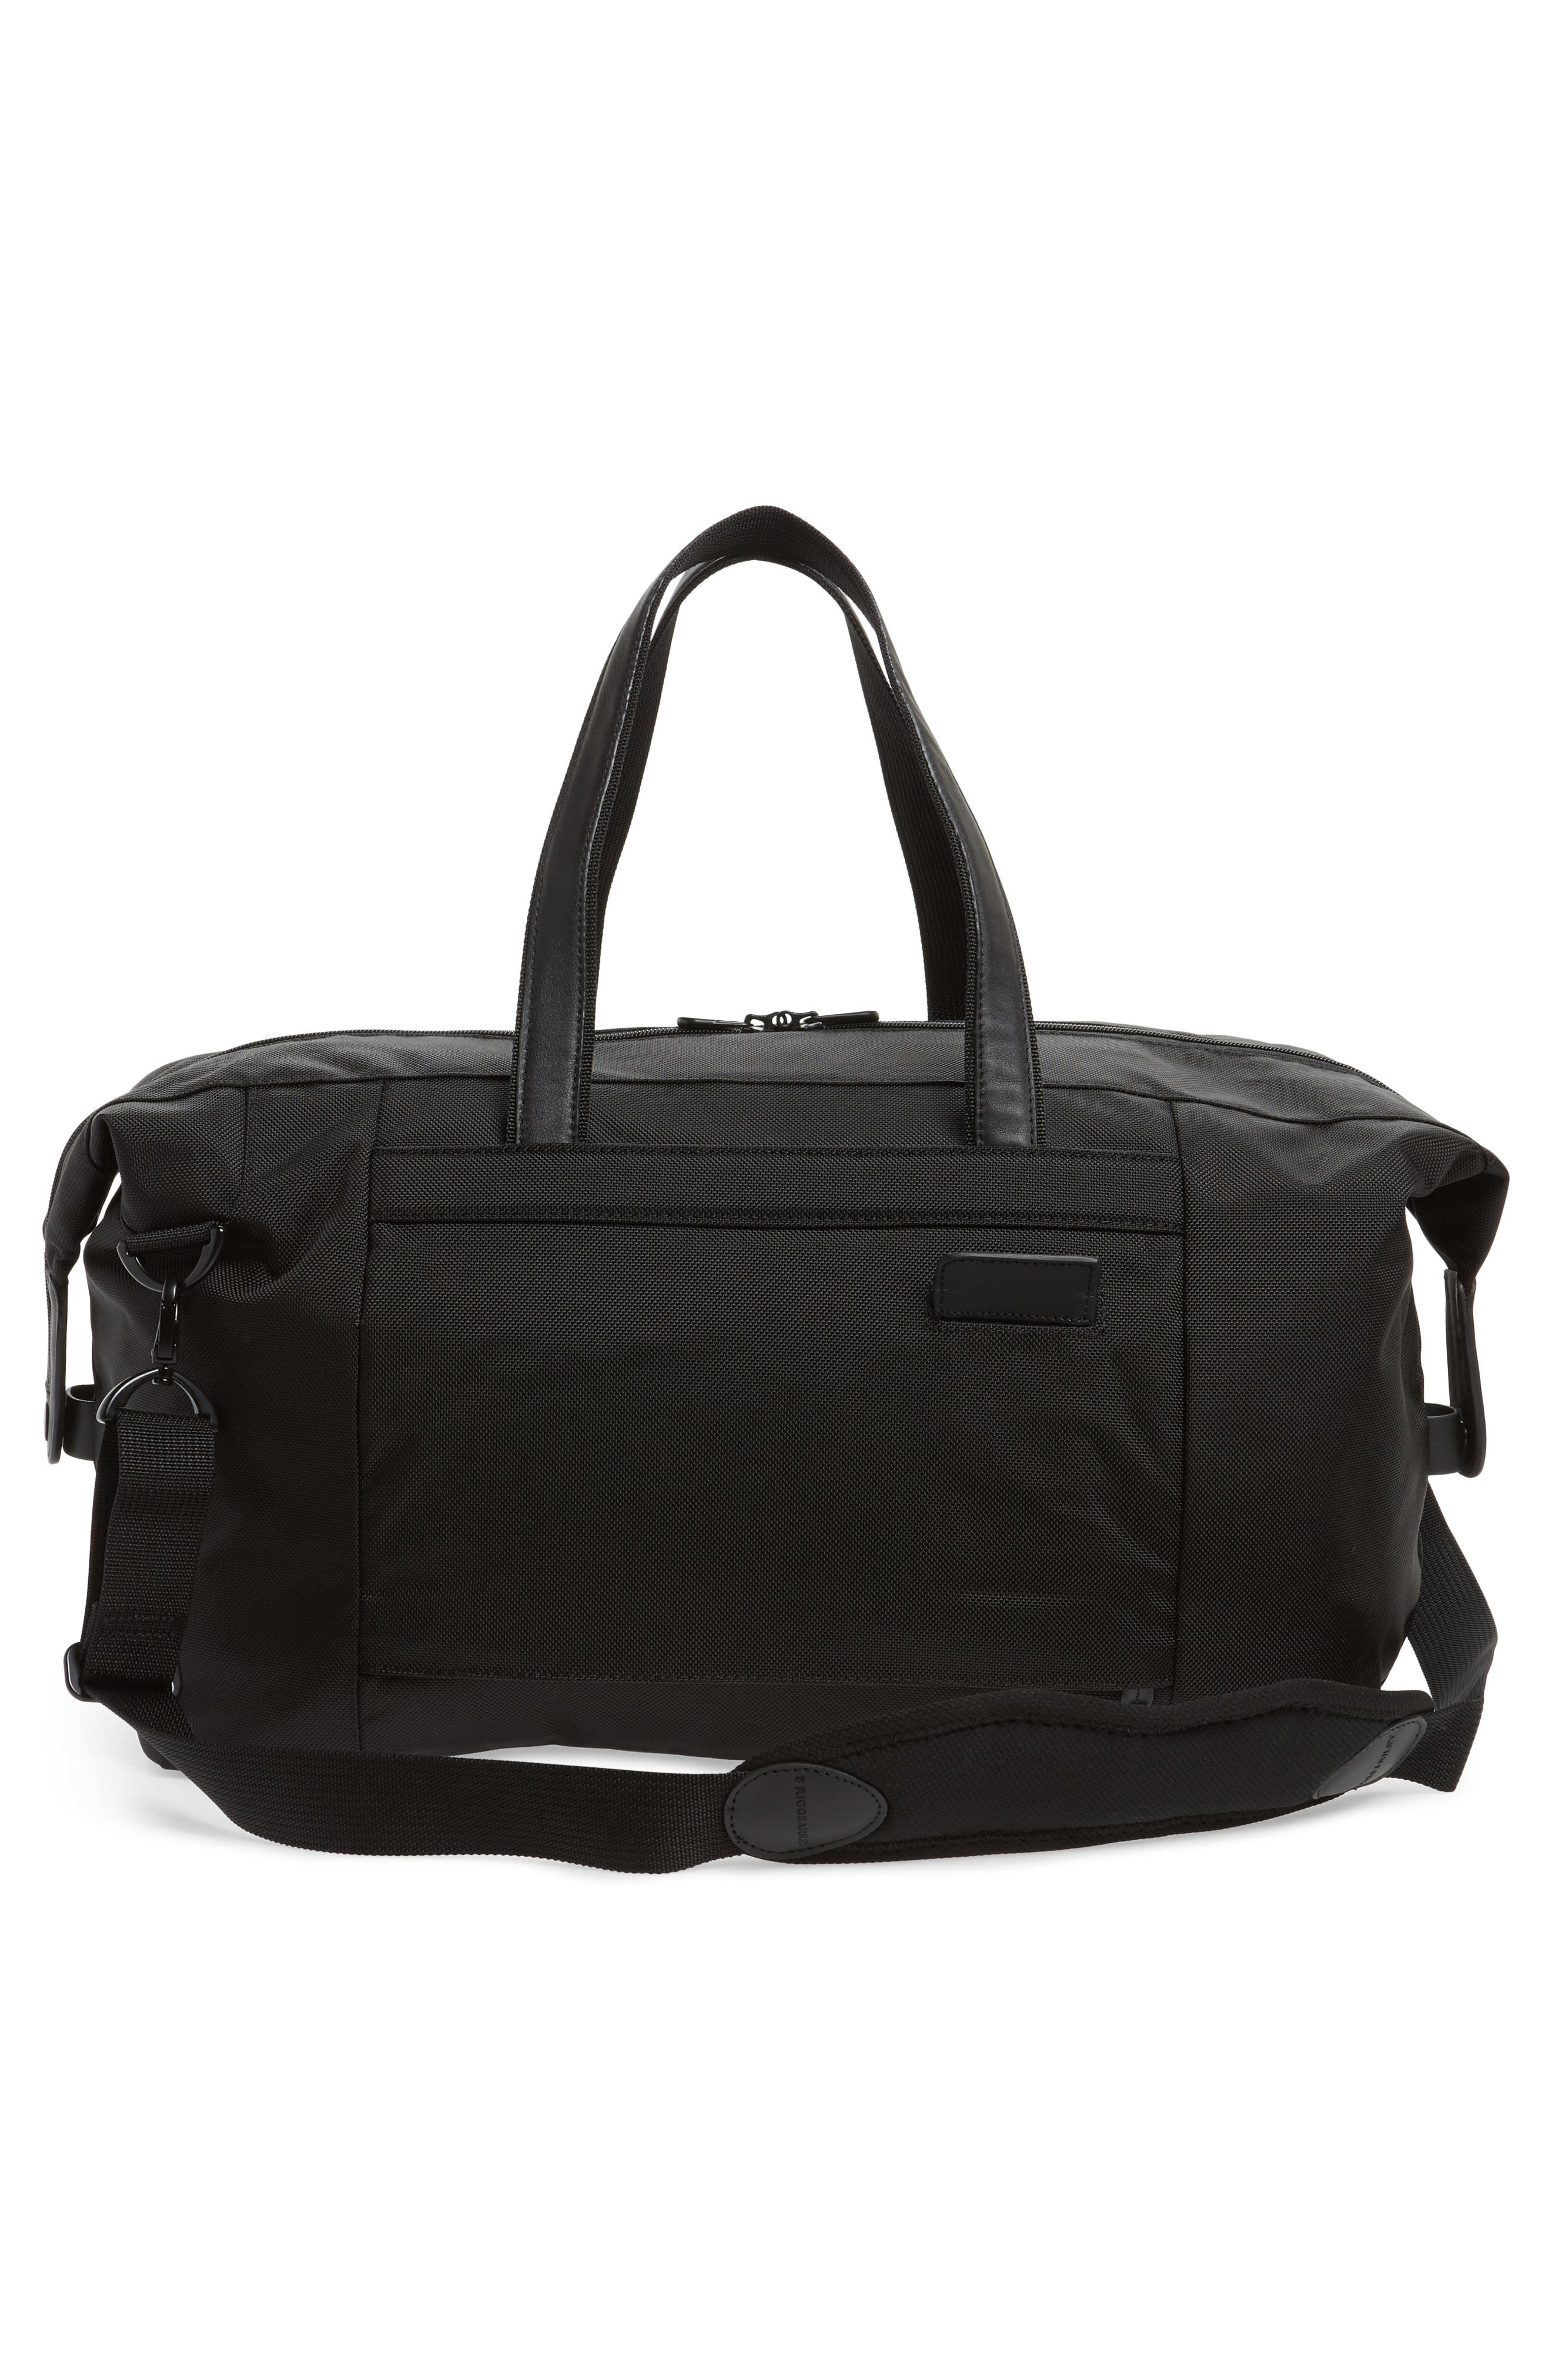 BRIGGS & RILEY,                             'Baseline' Duffel Bag,                             Alternate thumbnail 3, color,                             BLACK